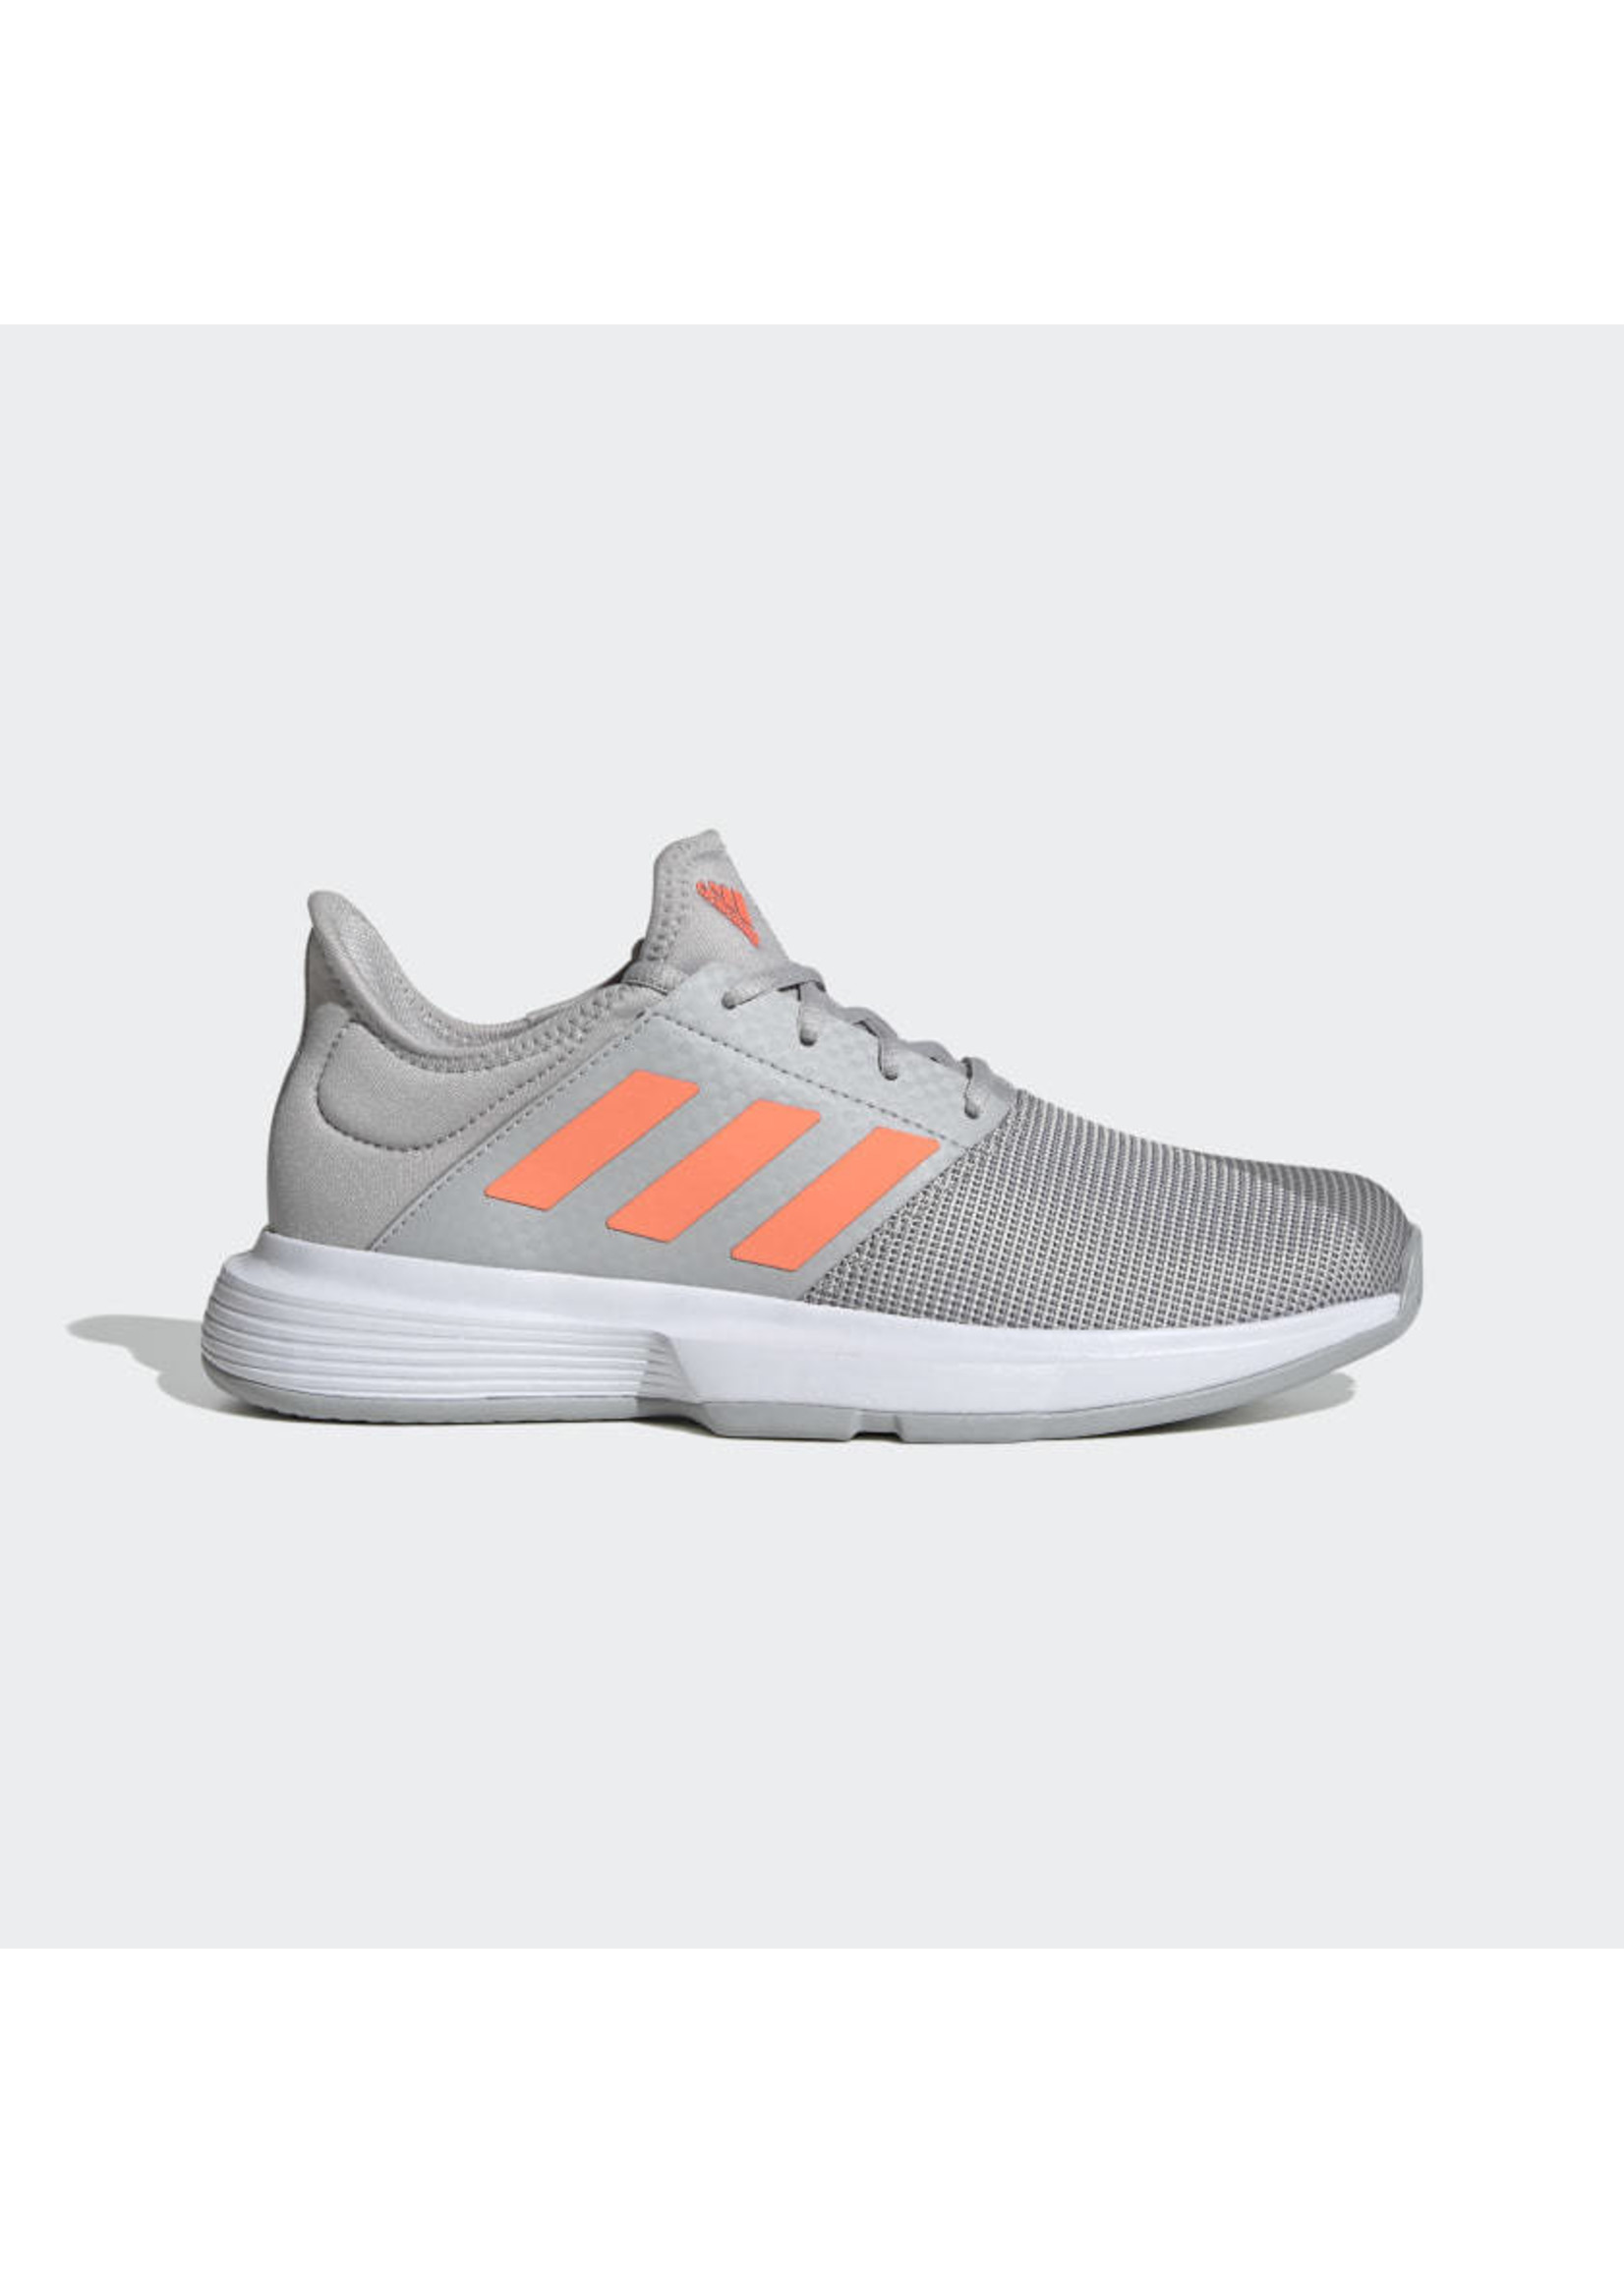 Adidas Adidas GameCourt Tennis Shoe (2020)